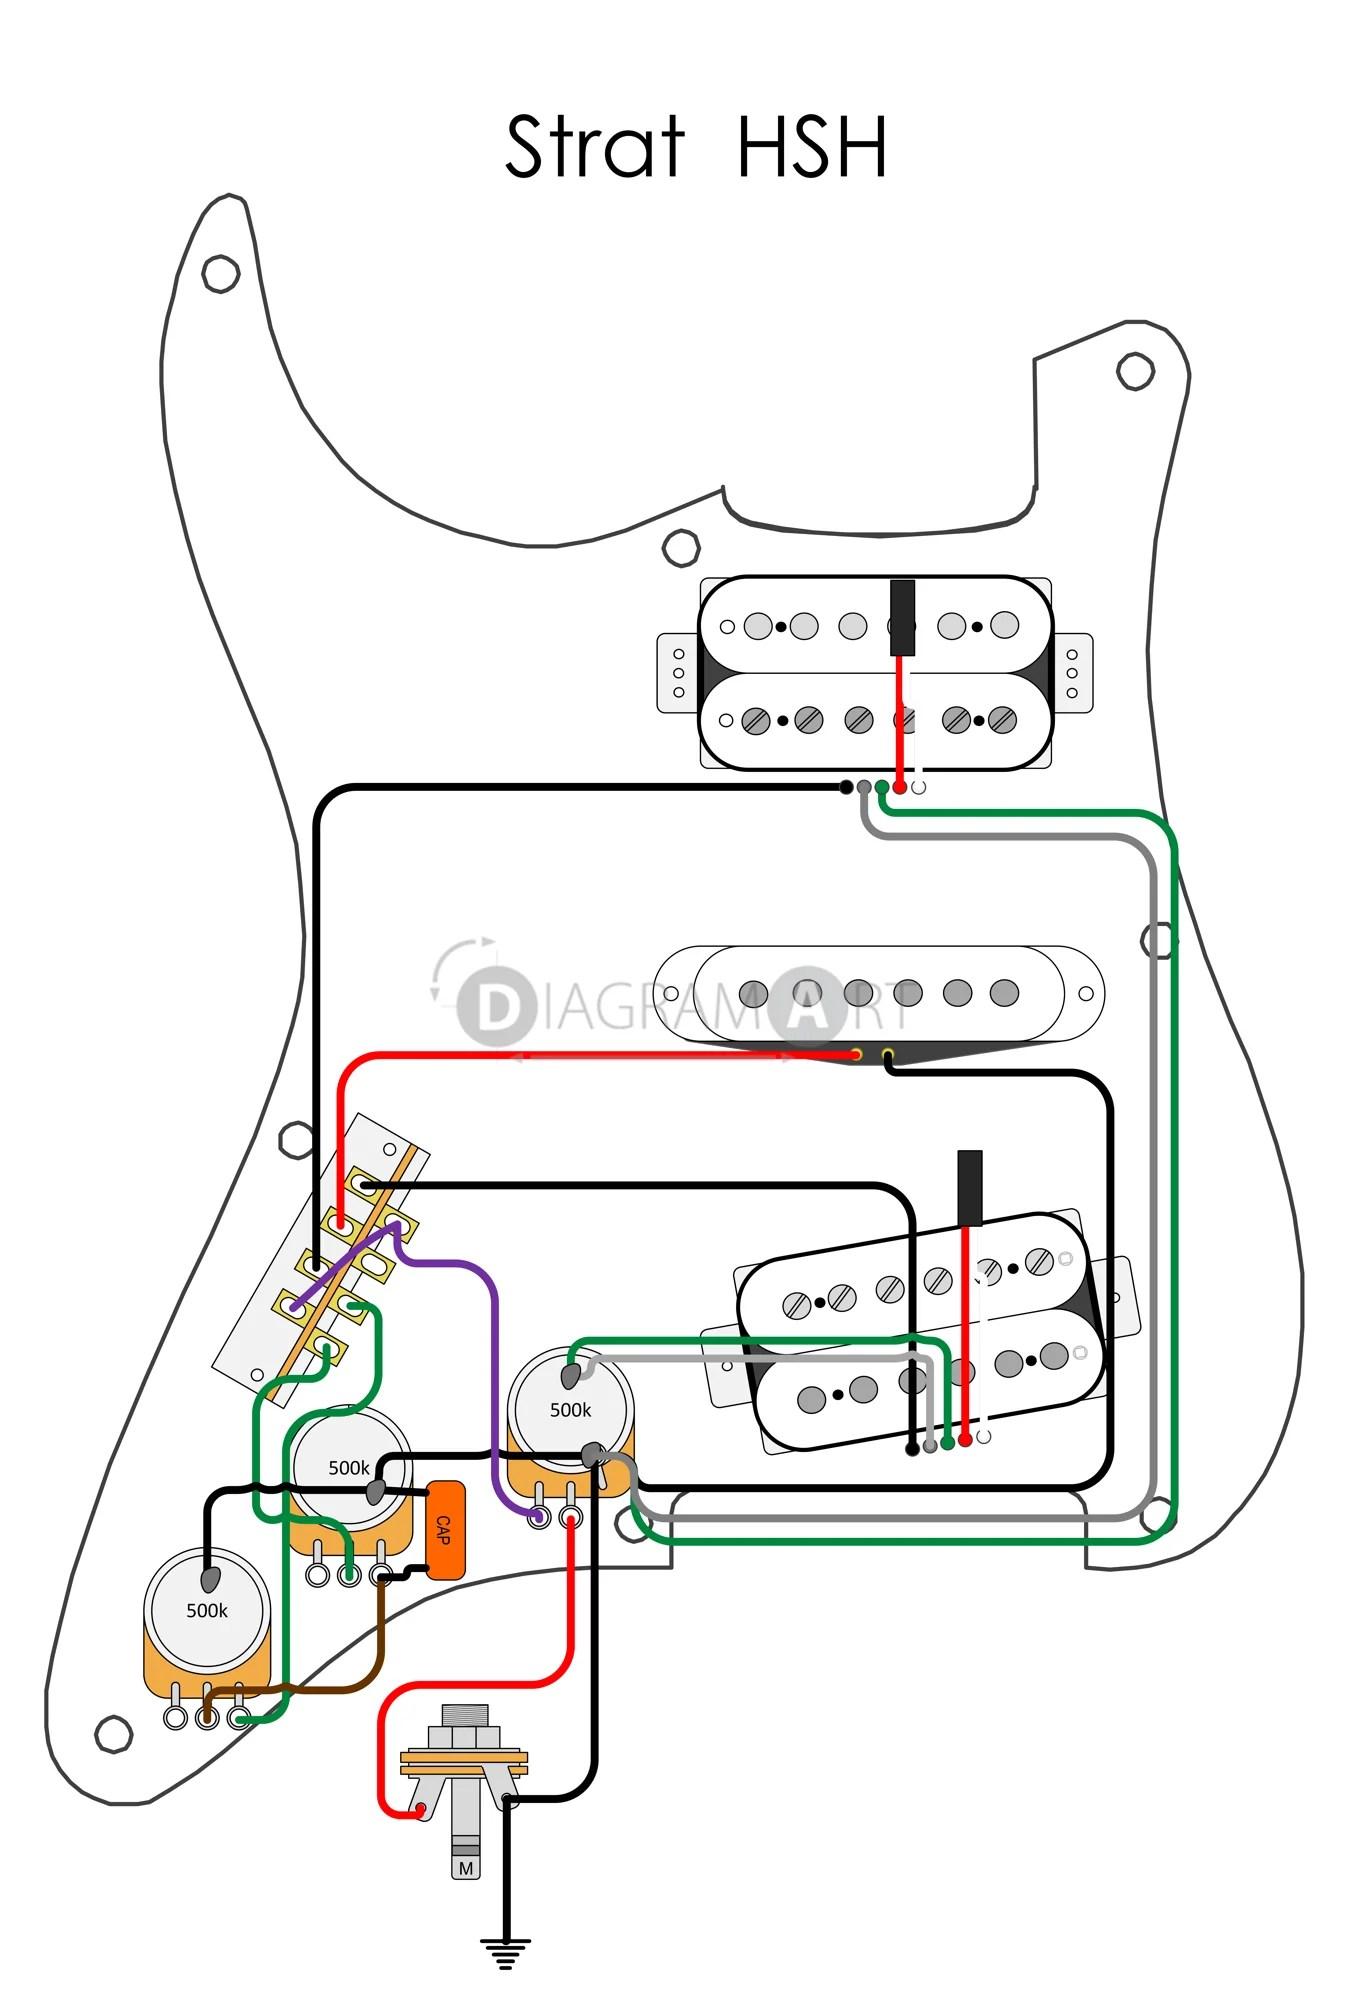 medium resolution of free download guitar wiring diagrams diagram jem simple wiring schema car air horn wiring diagram guitar wiring diagram hsh